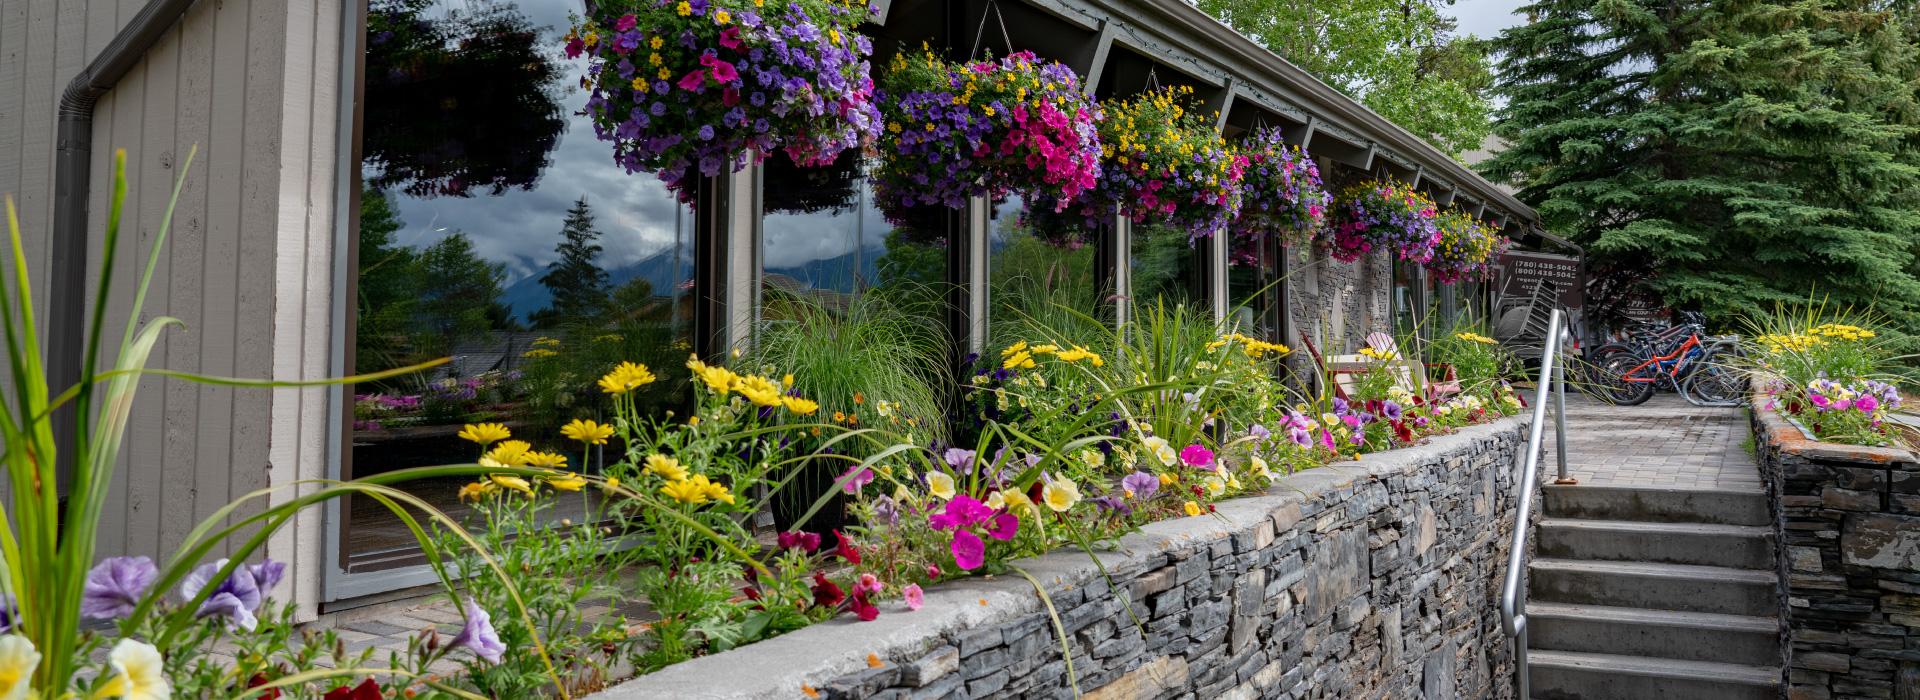 tunnel mountain resort - banff condos - location